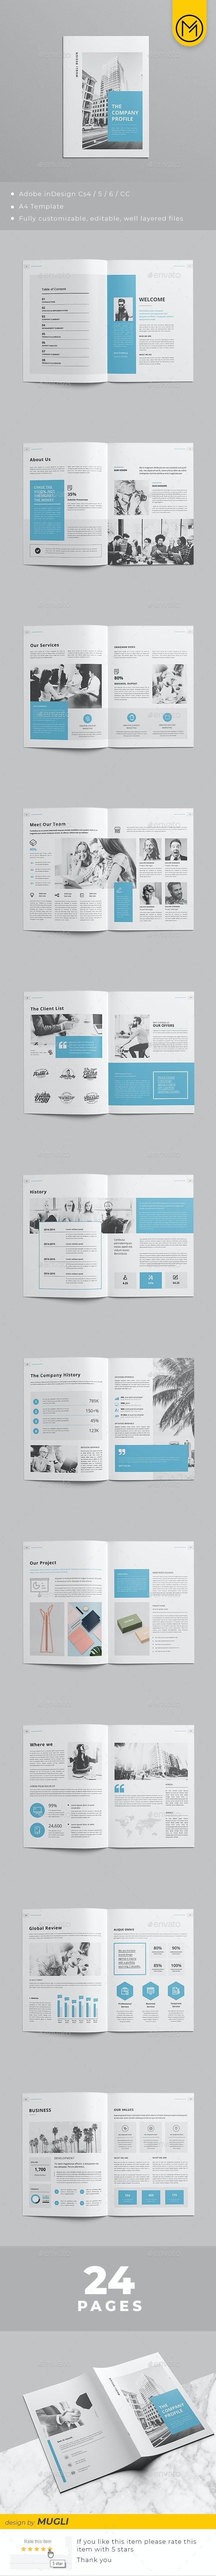 Company Profile v2 - Corporate Brochures